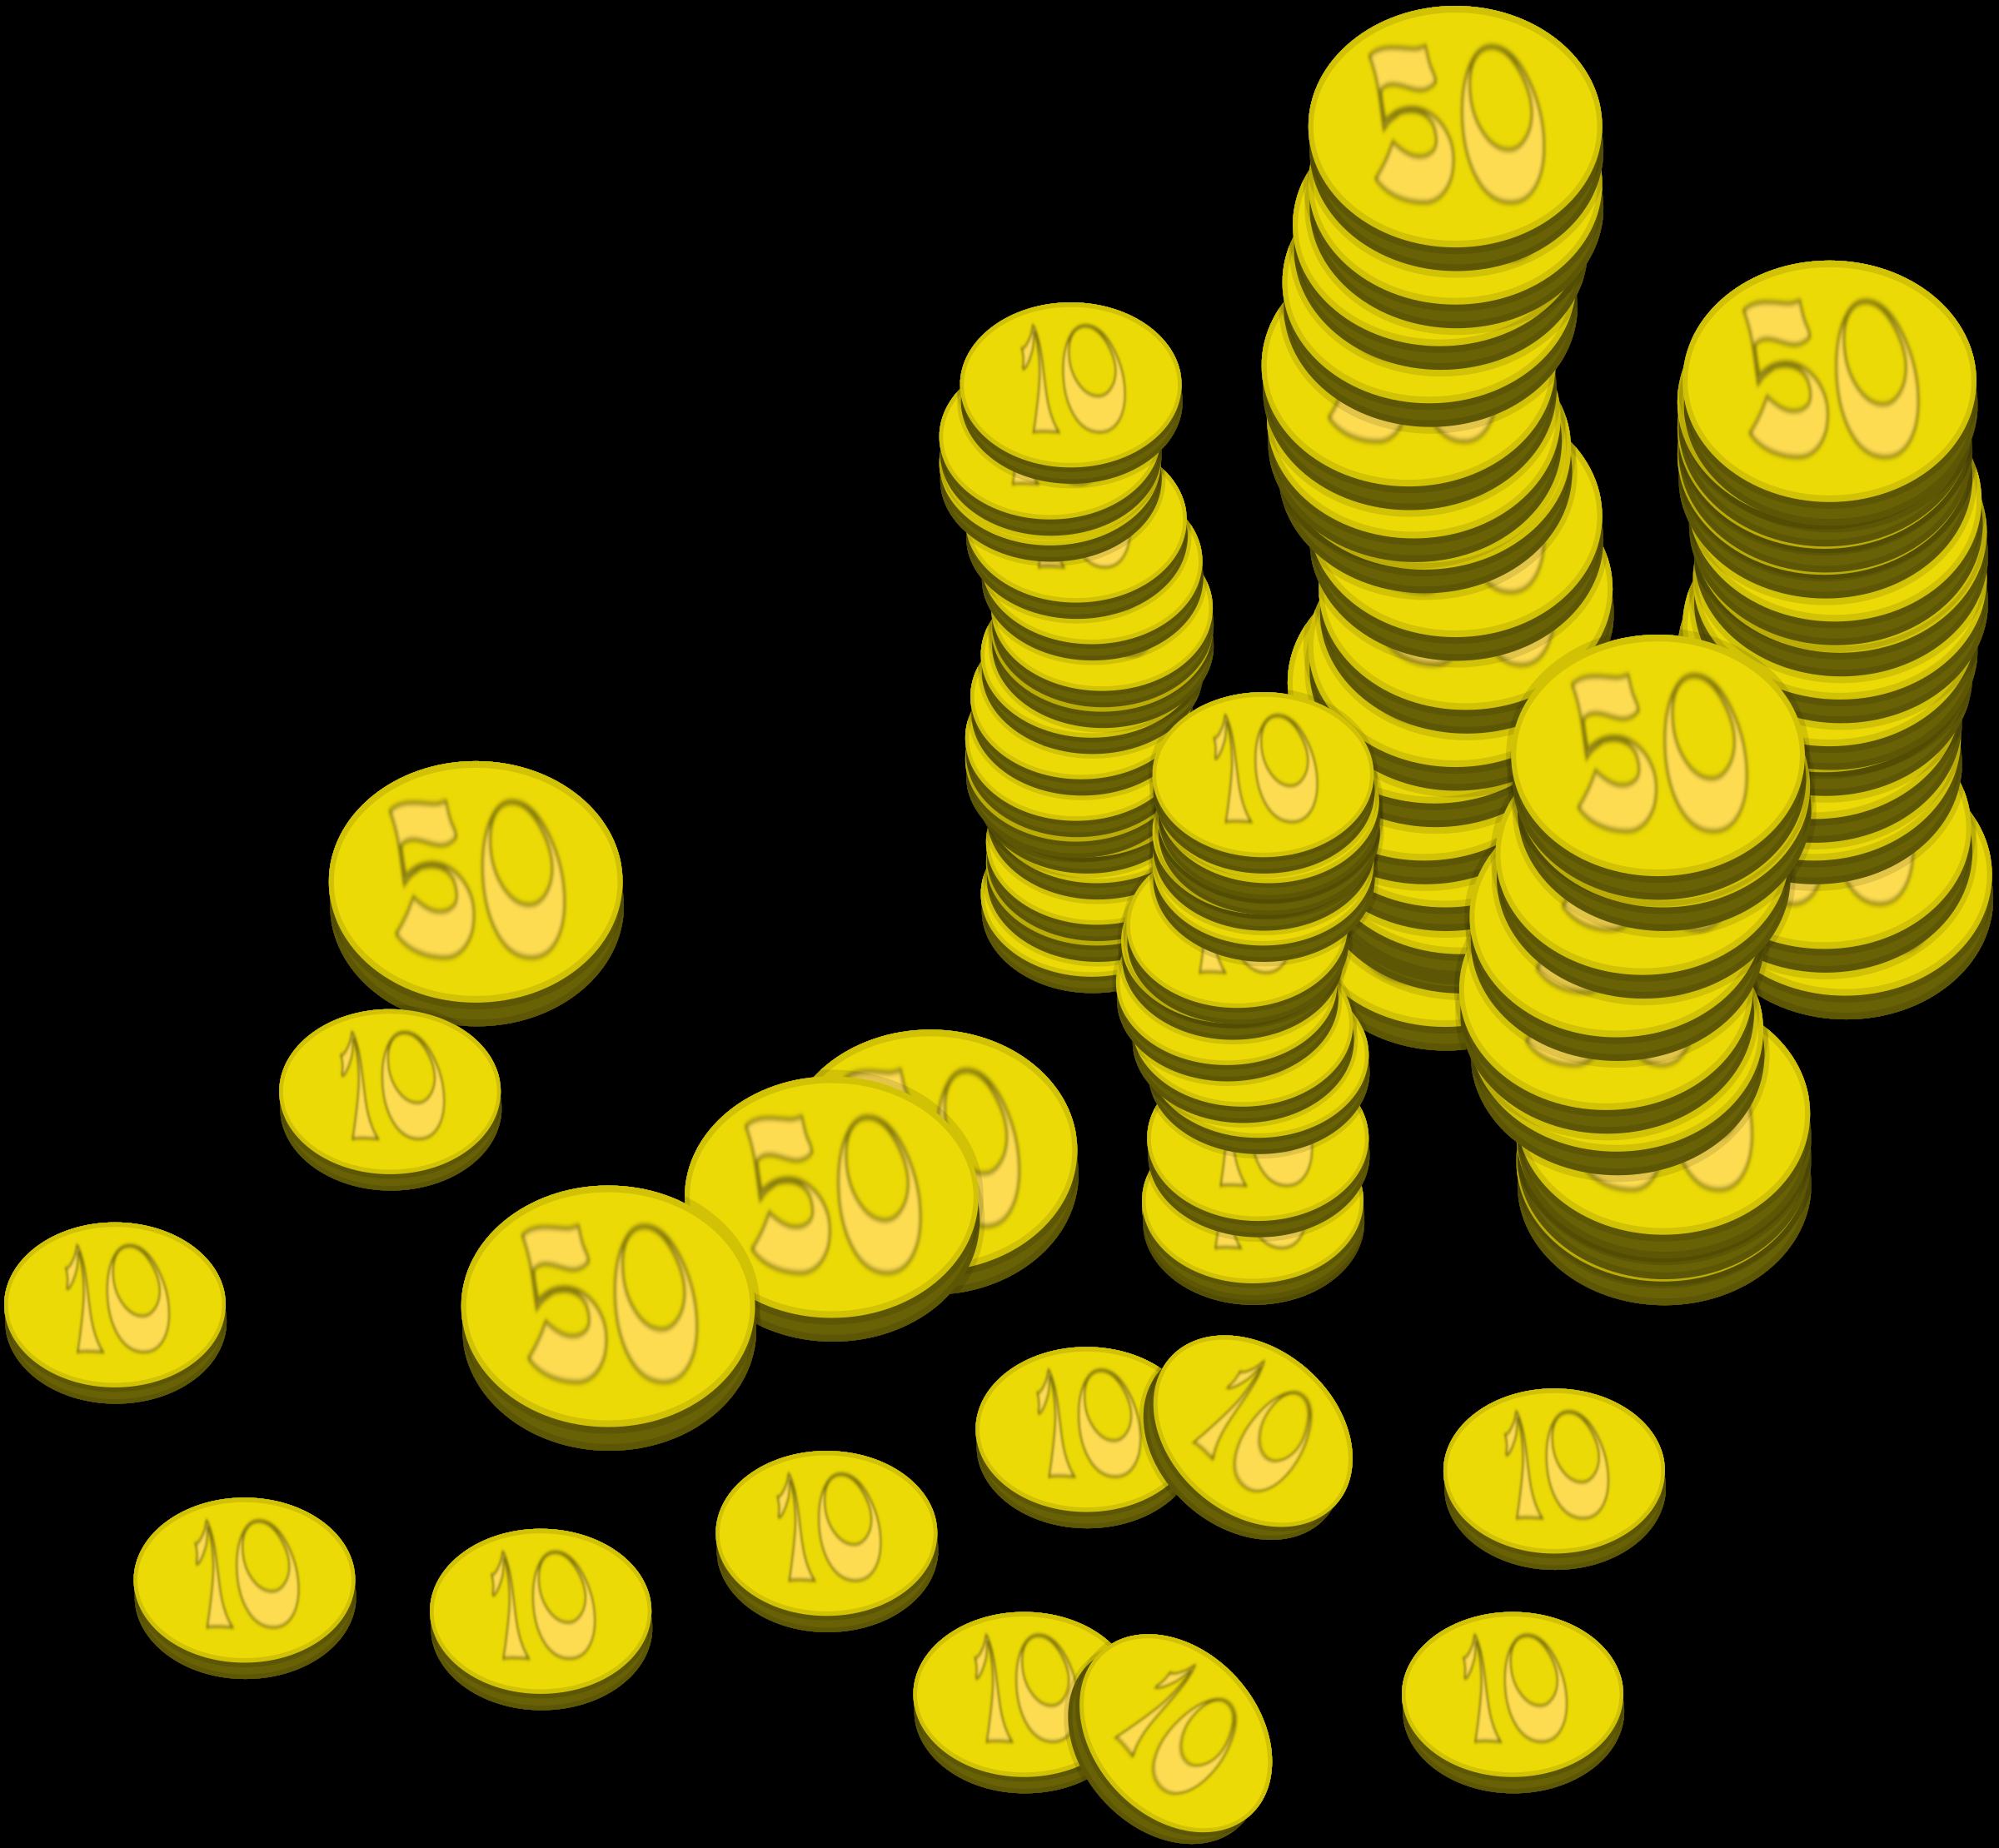 Zucchini clipart patola. Coins money big image